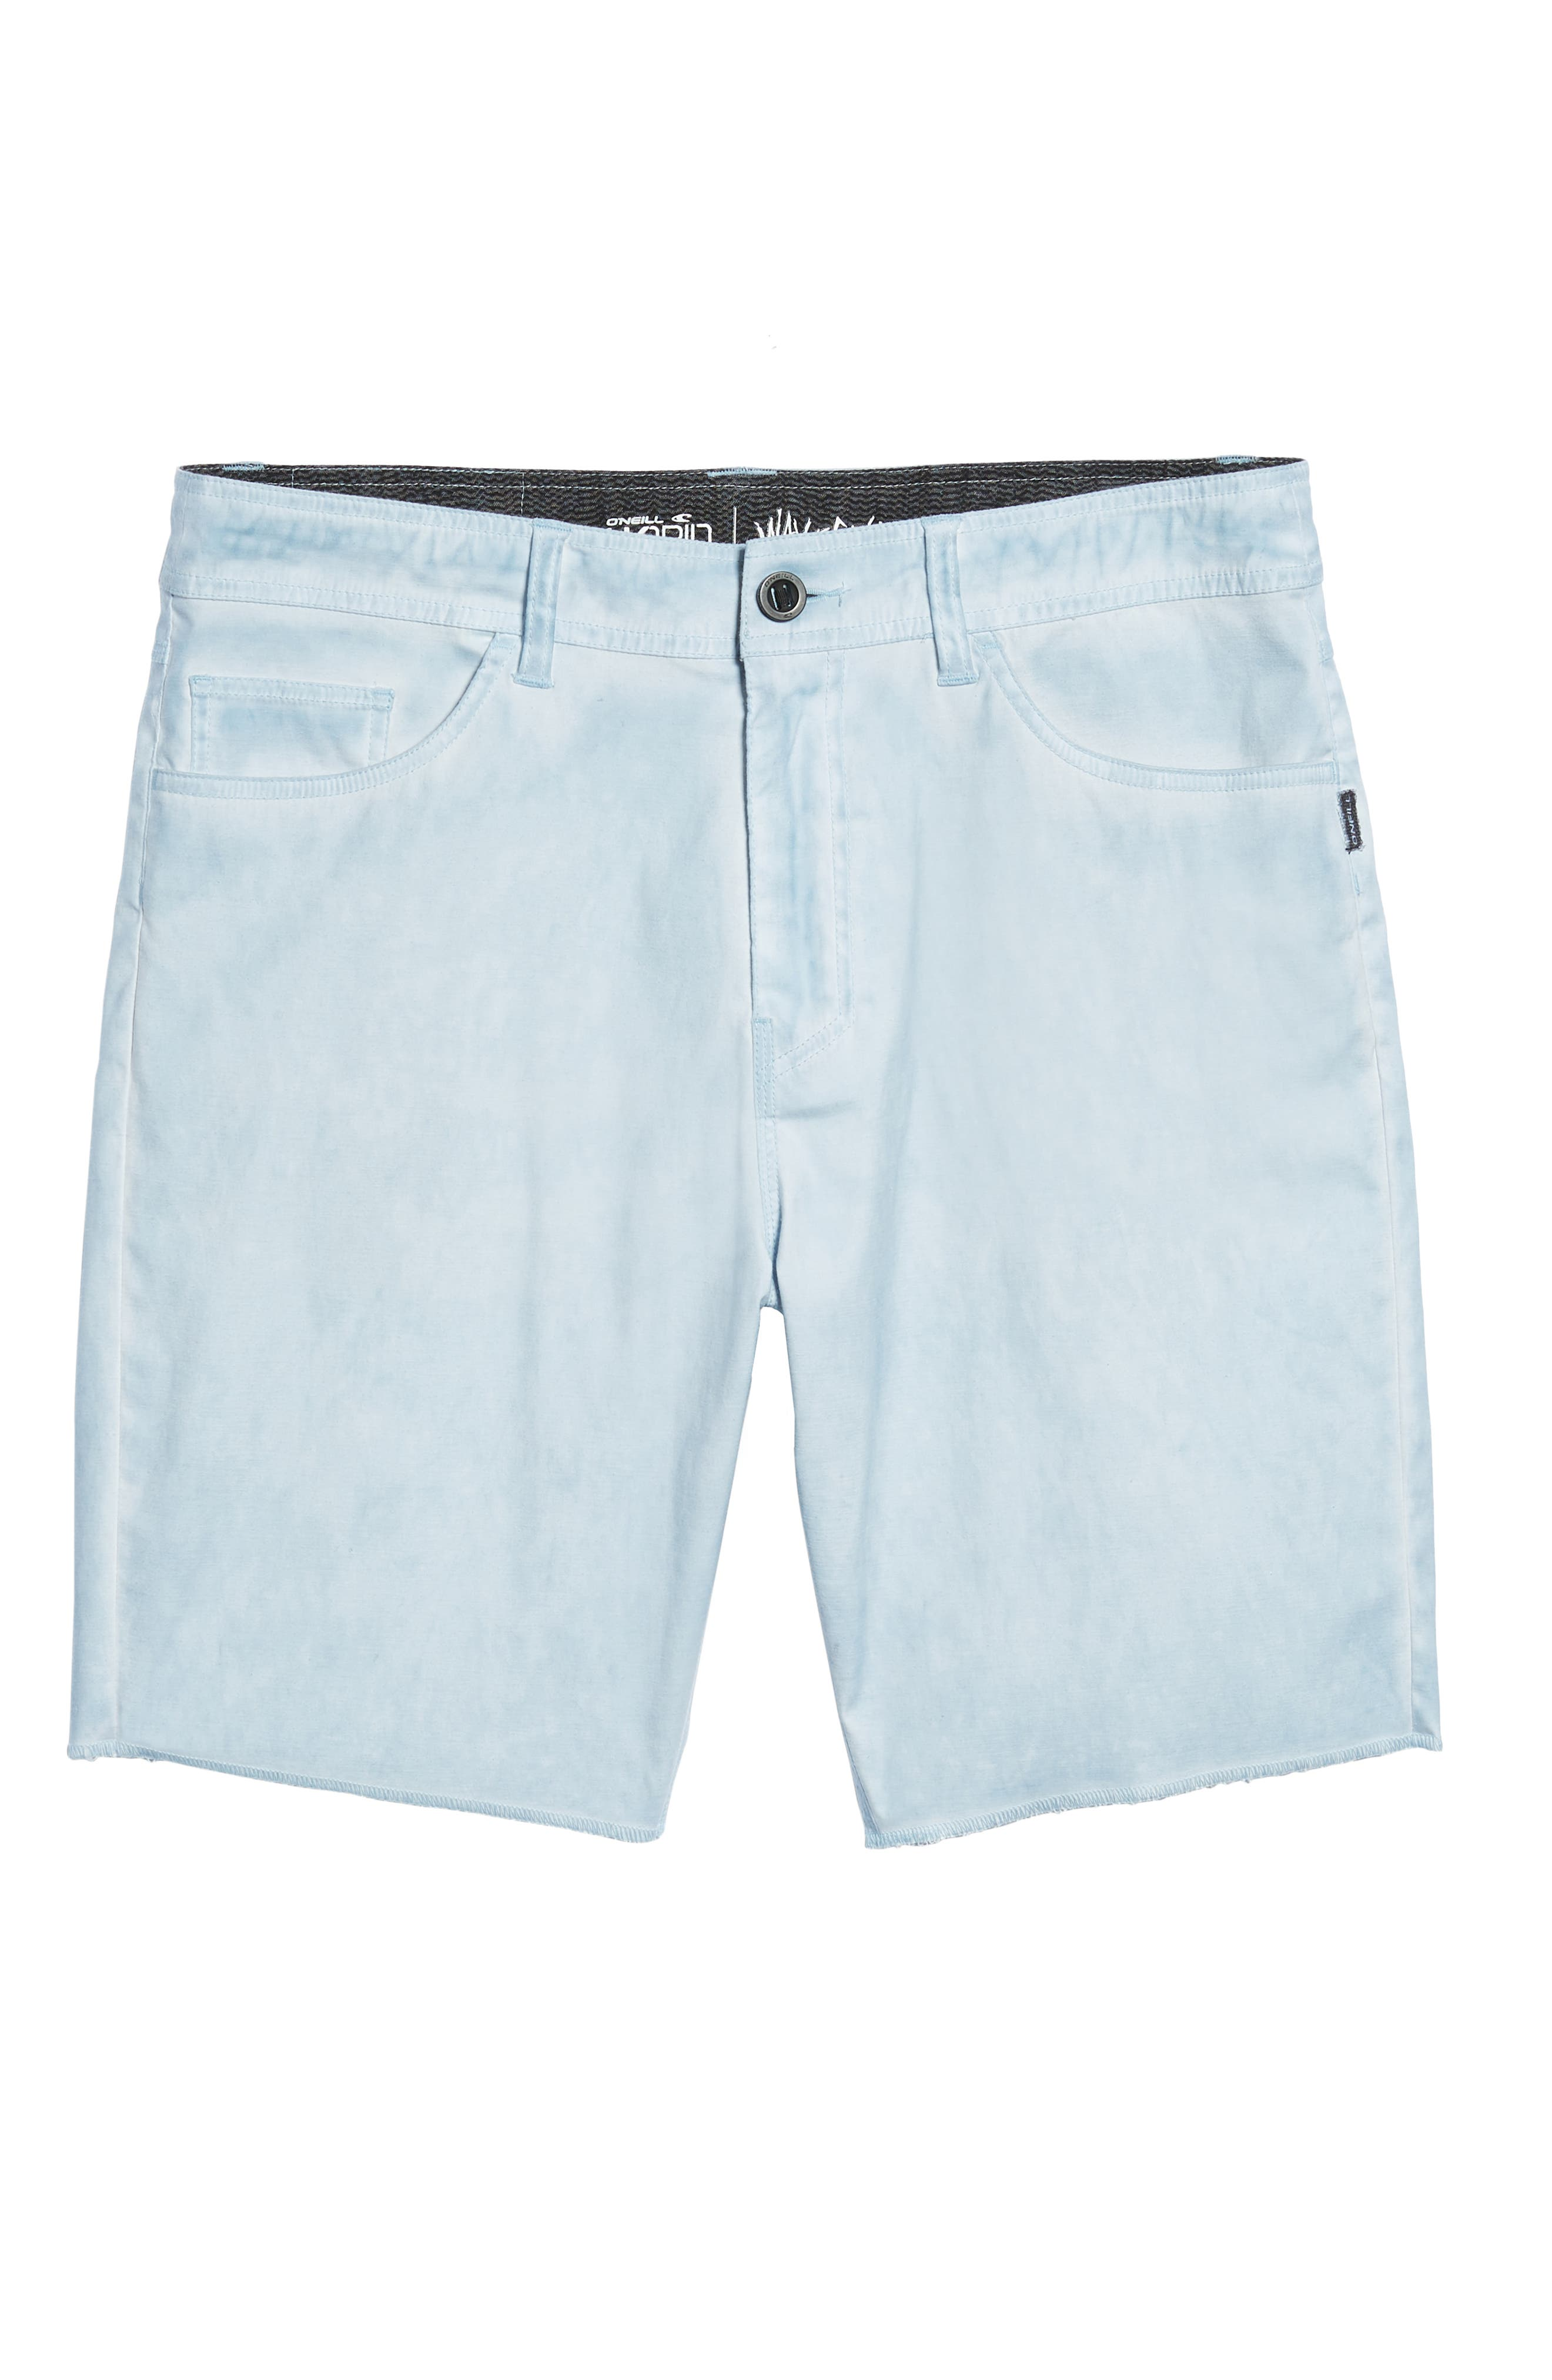 Kick Back Hybrid Shorts,                             Alternate thumbnail 6, color,                             Light Indigo